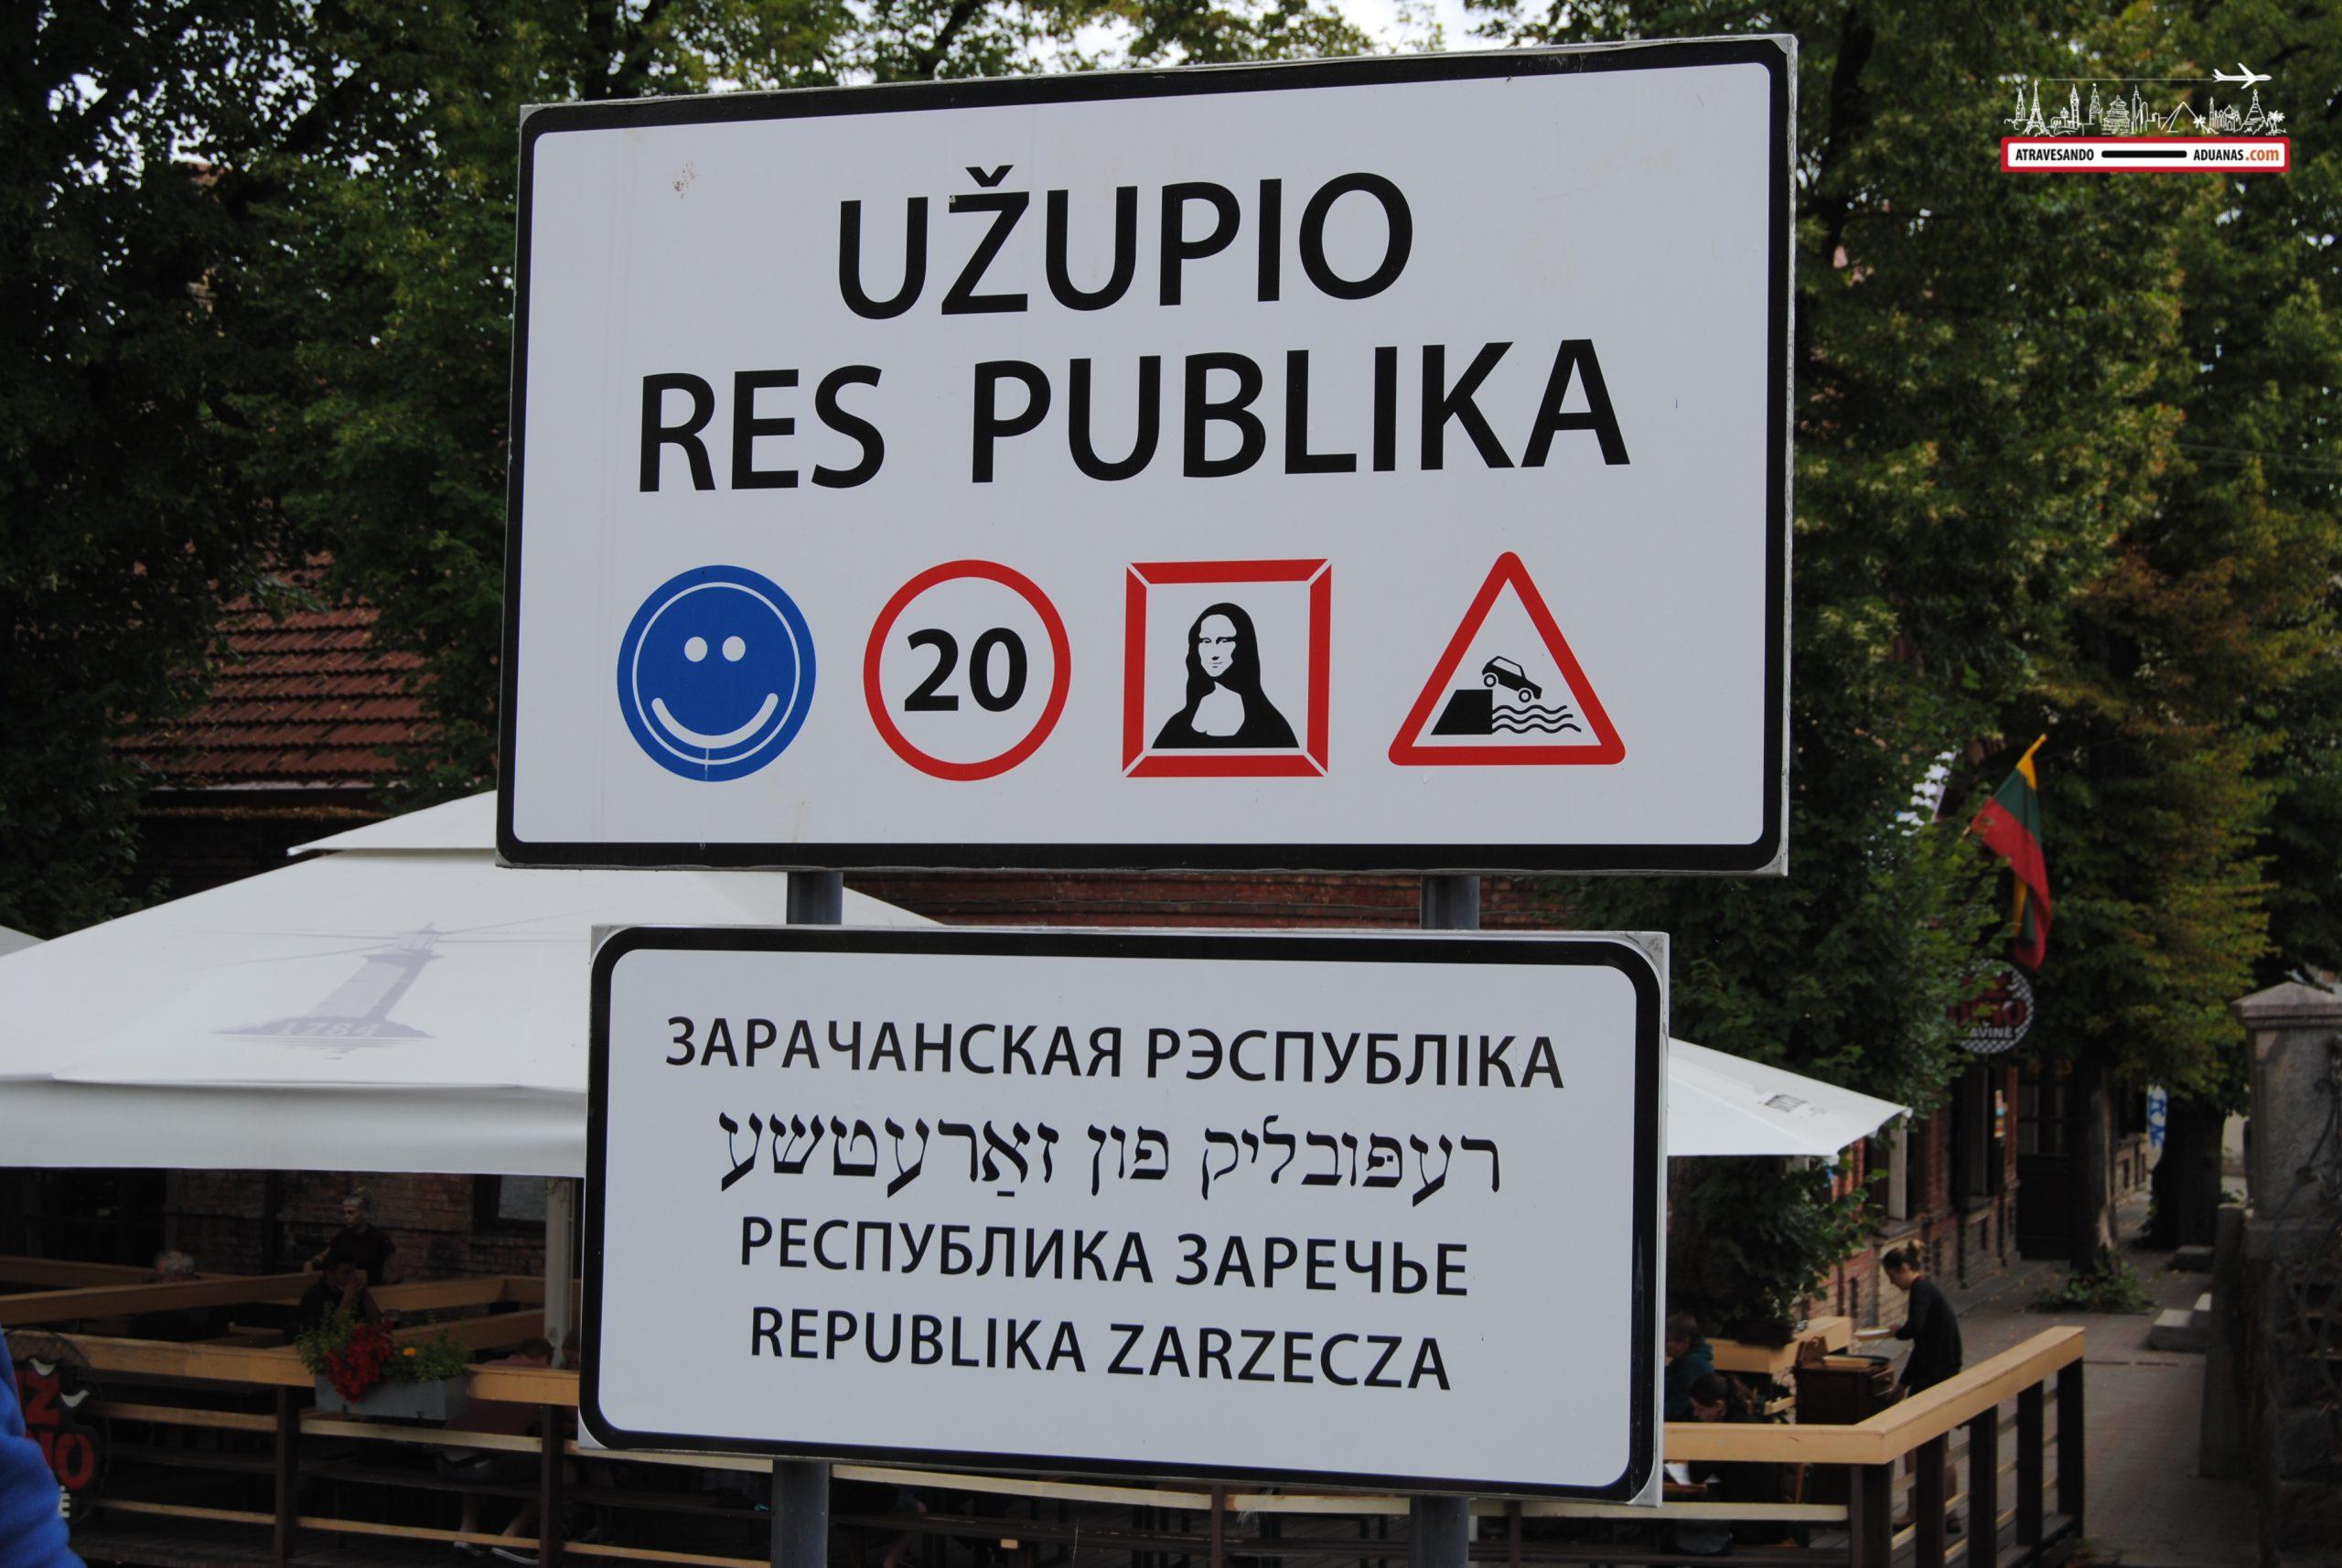 Letrero de la república de Uzupis, Vilnius